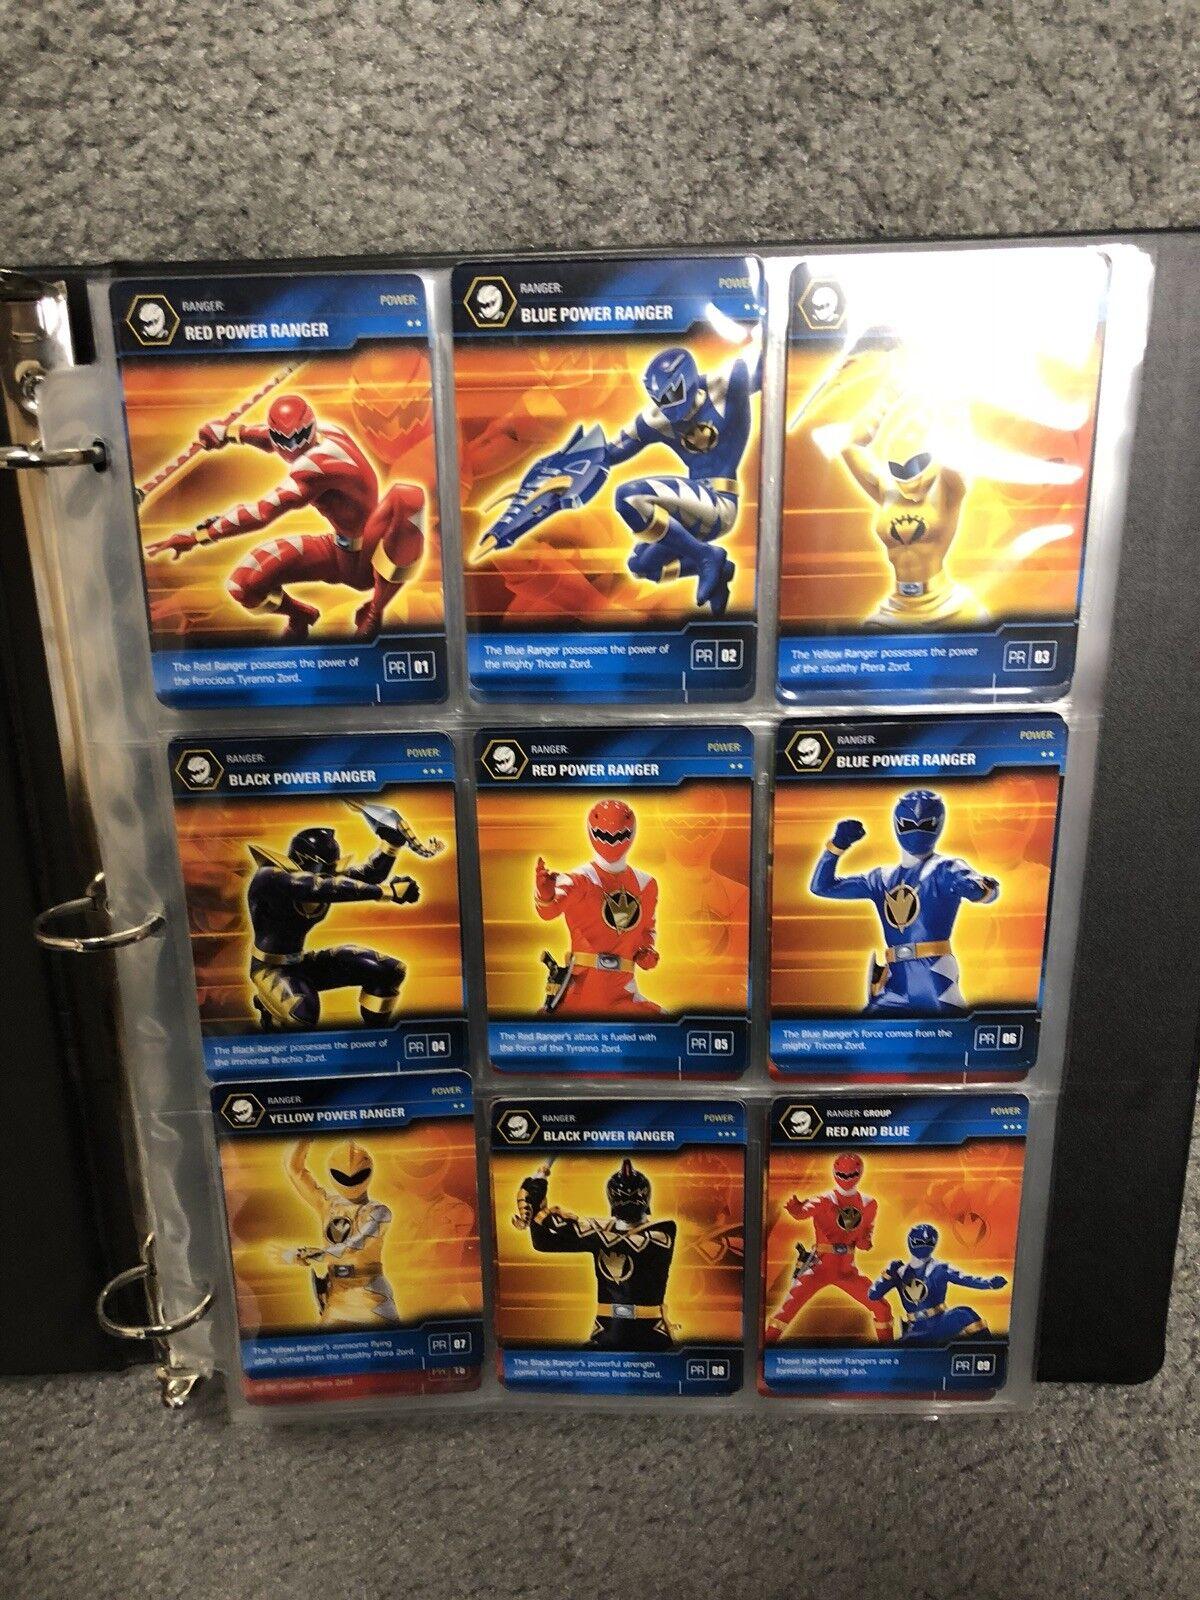 Power rangers dino donner meist kompletten trading cards gesetzt